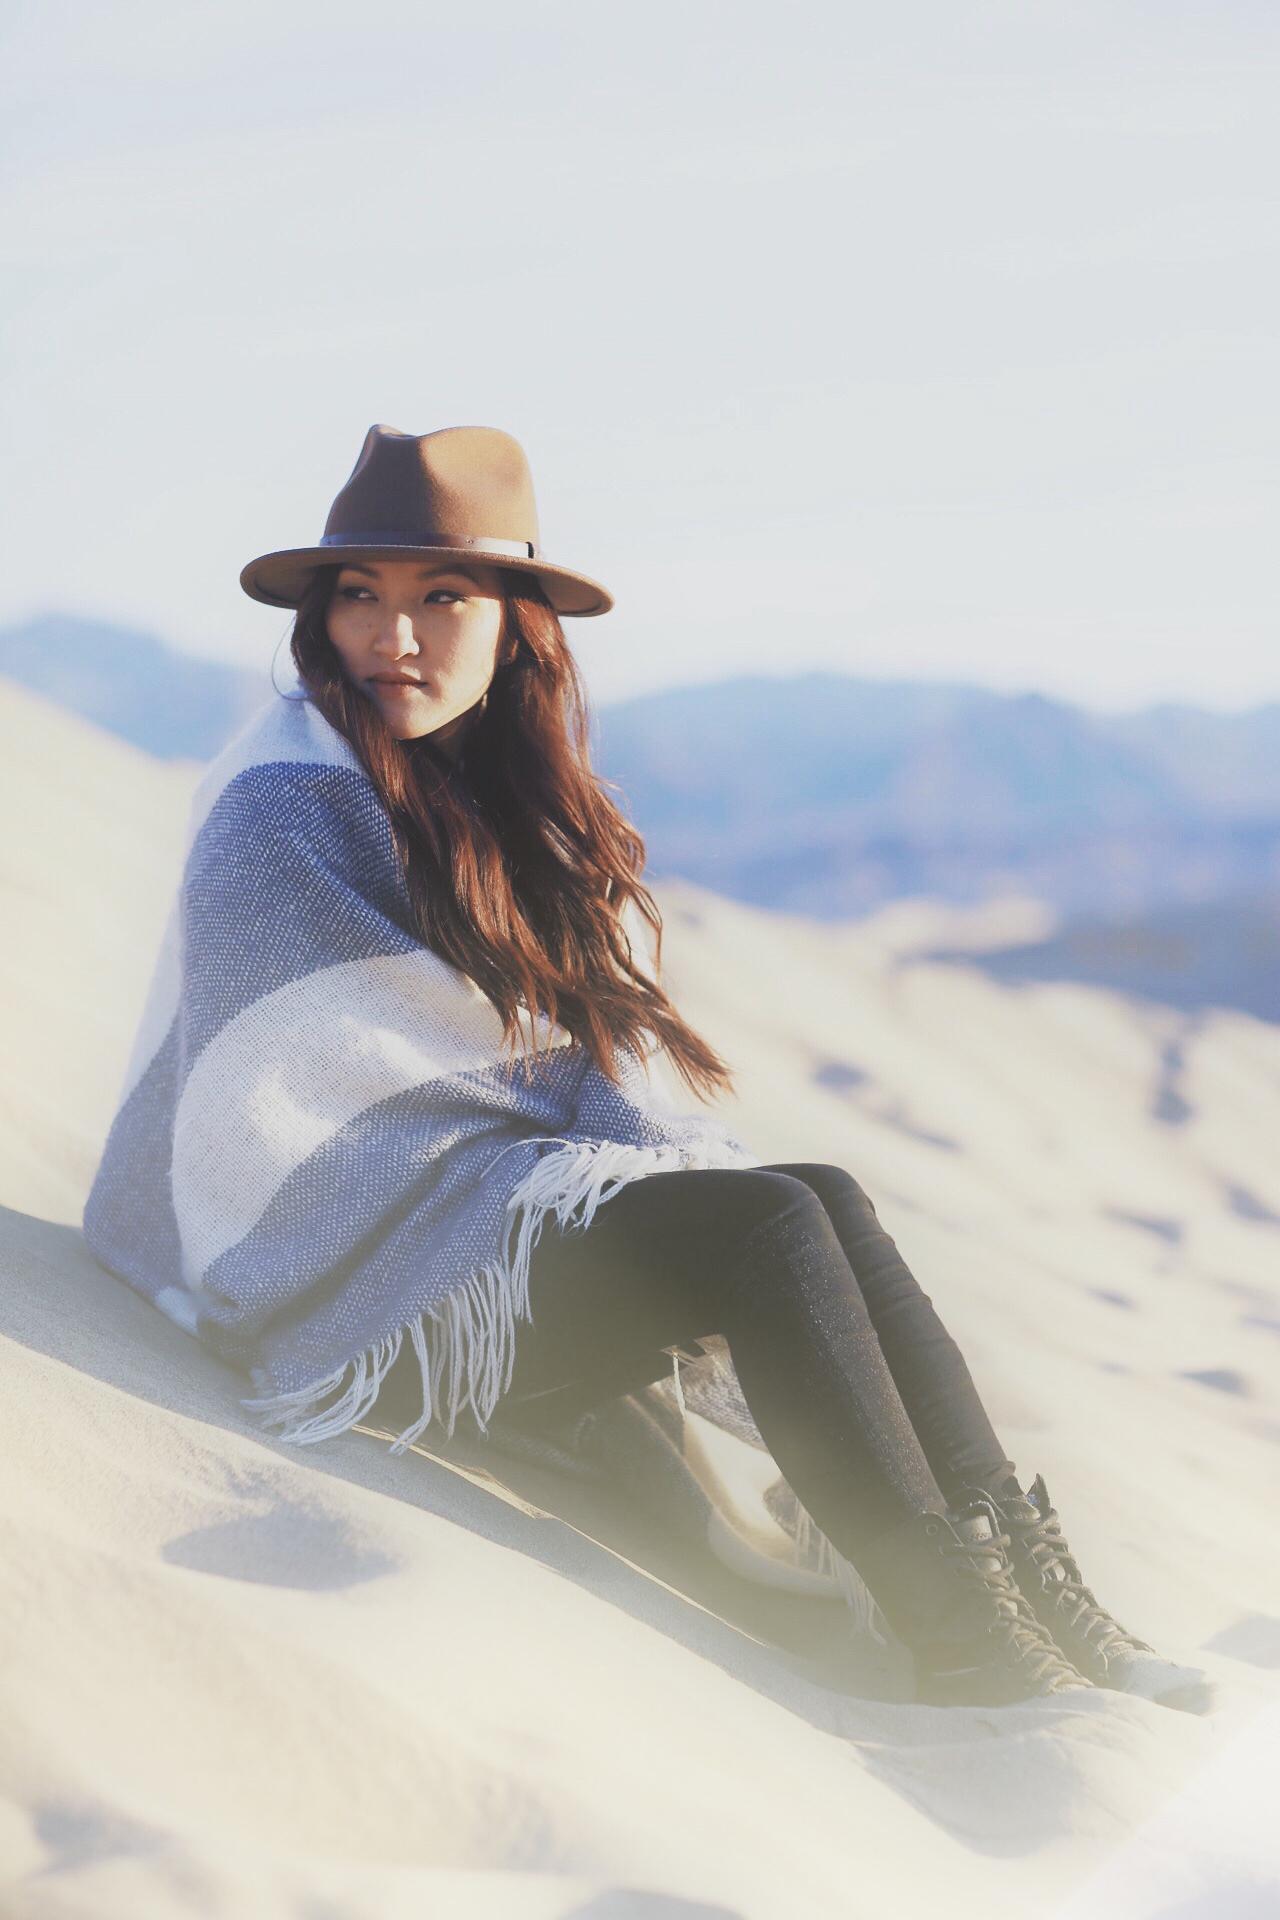 Death Valley 2015 (75 of 82).JPG